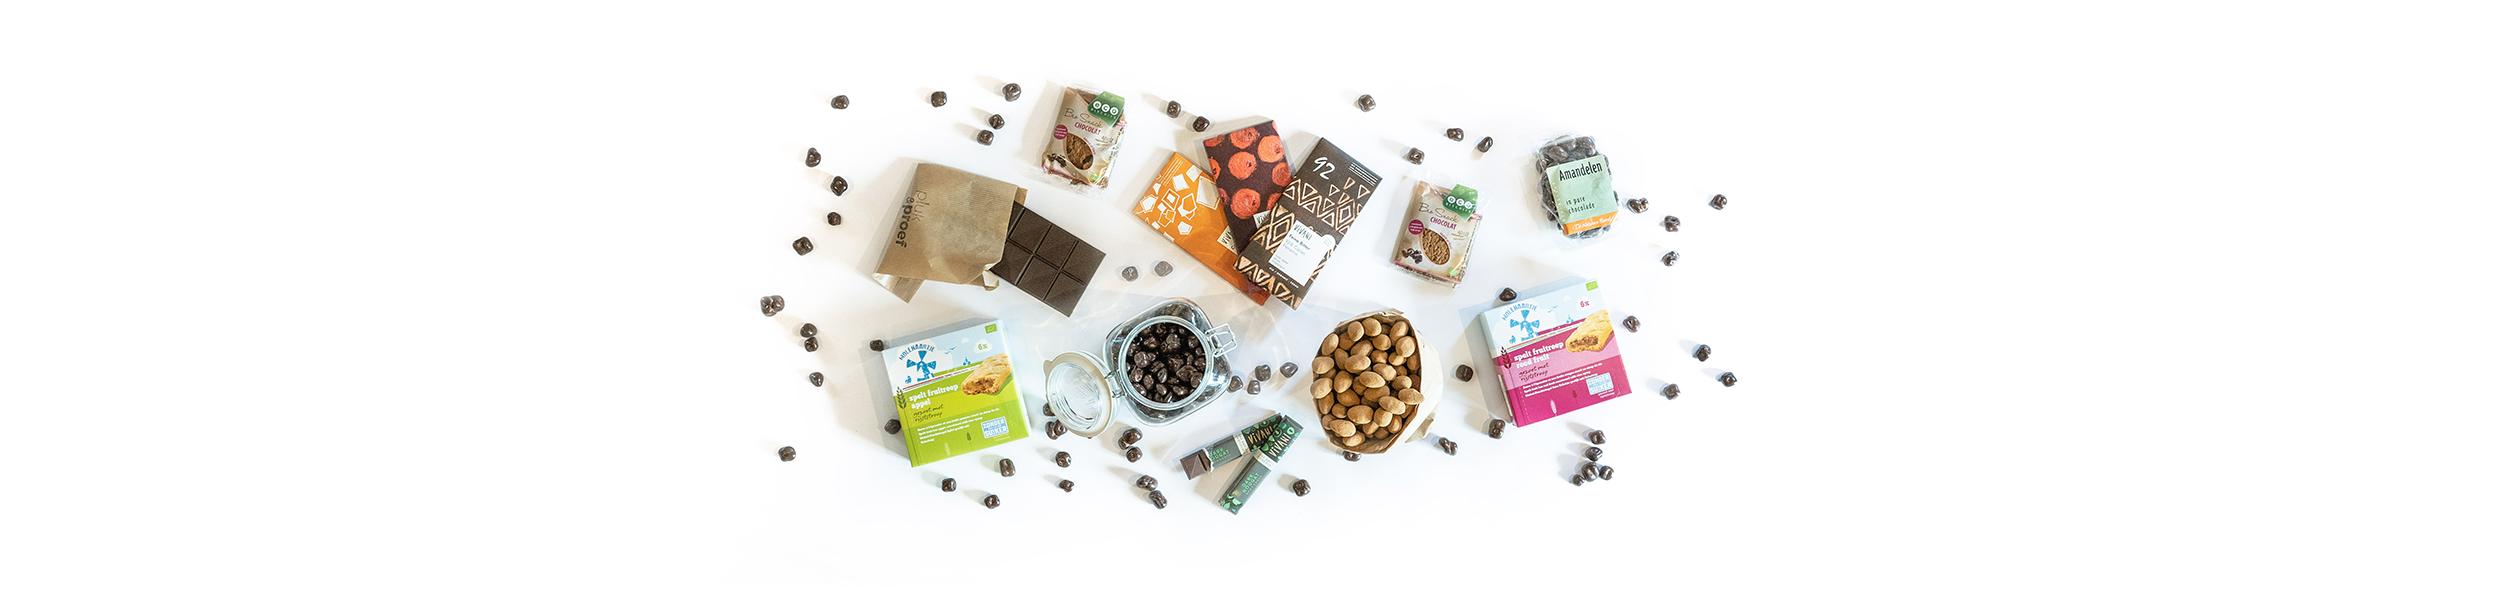 Chocolade, Snacks & Tussendoortjes